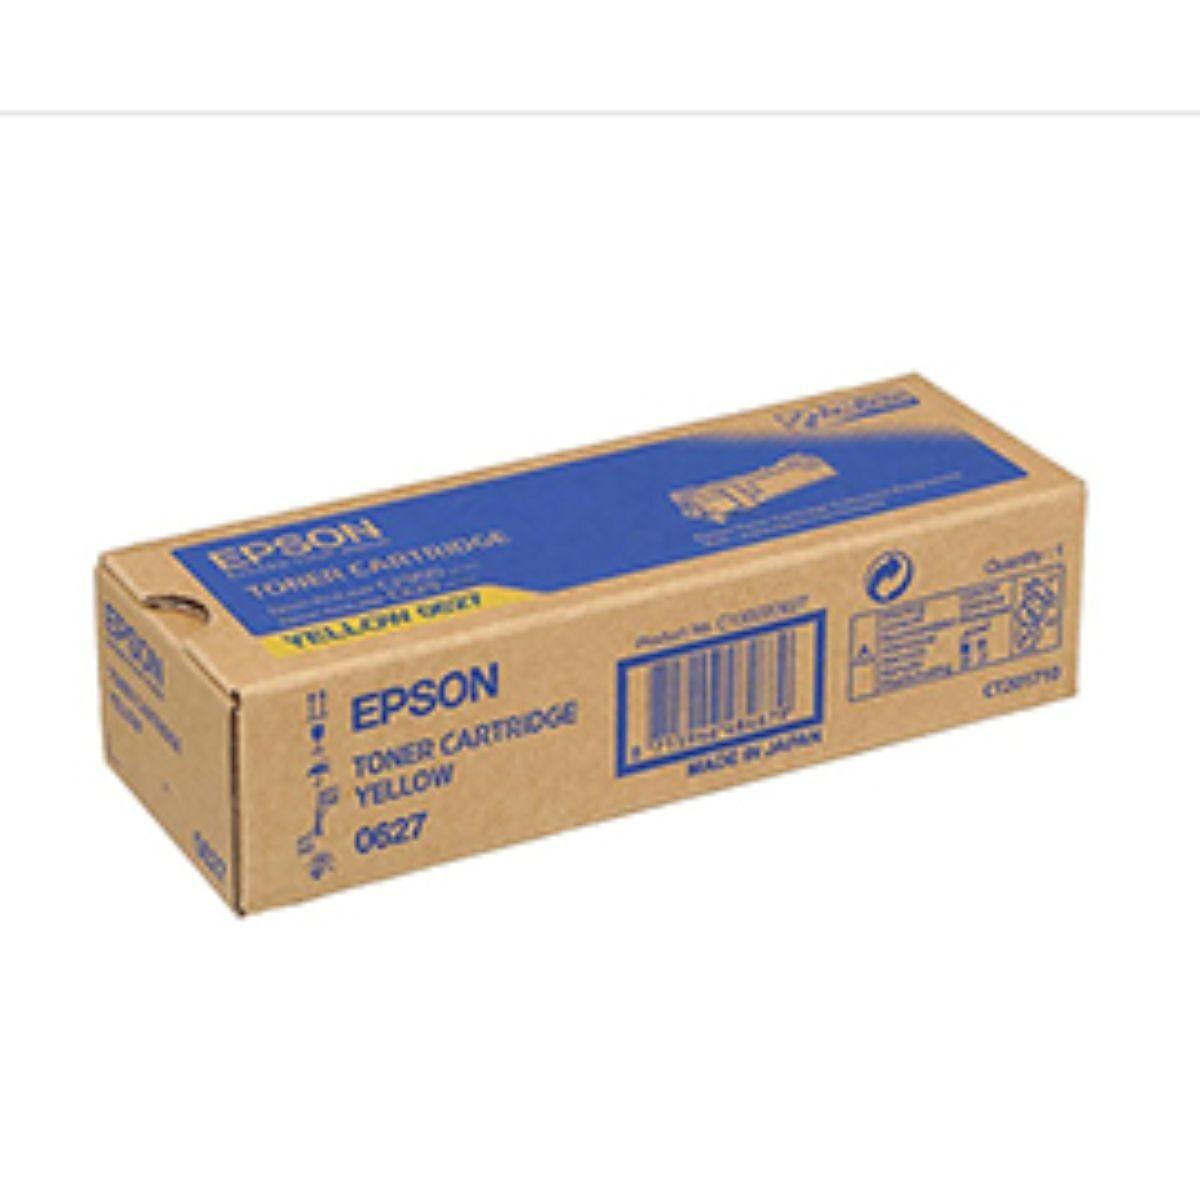 Epson AL-C2900N Toner Yellow